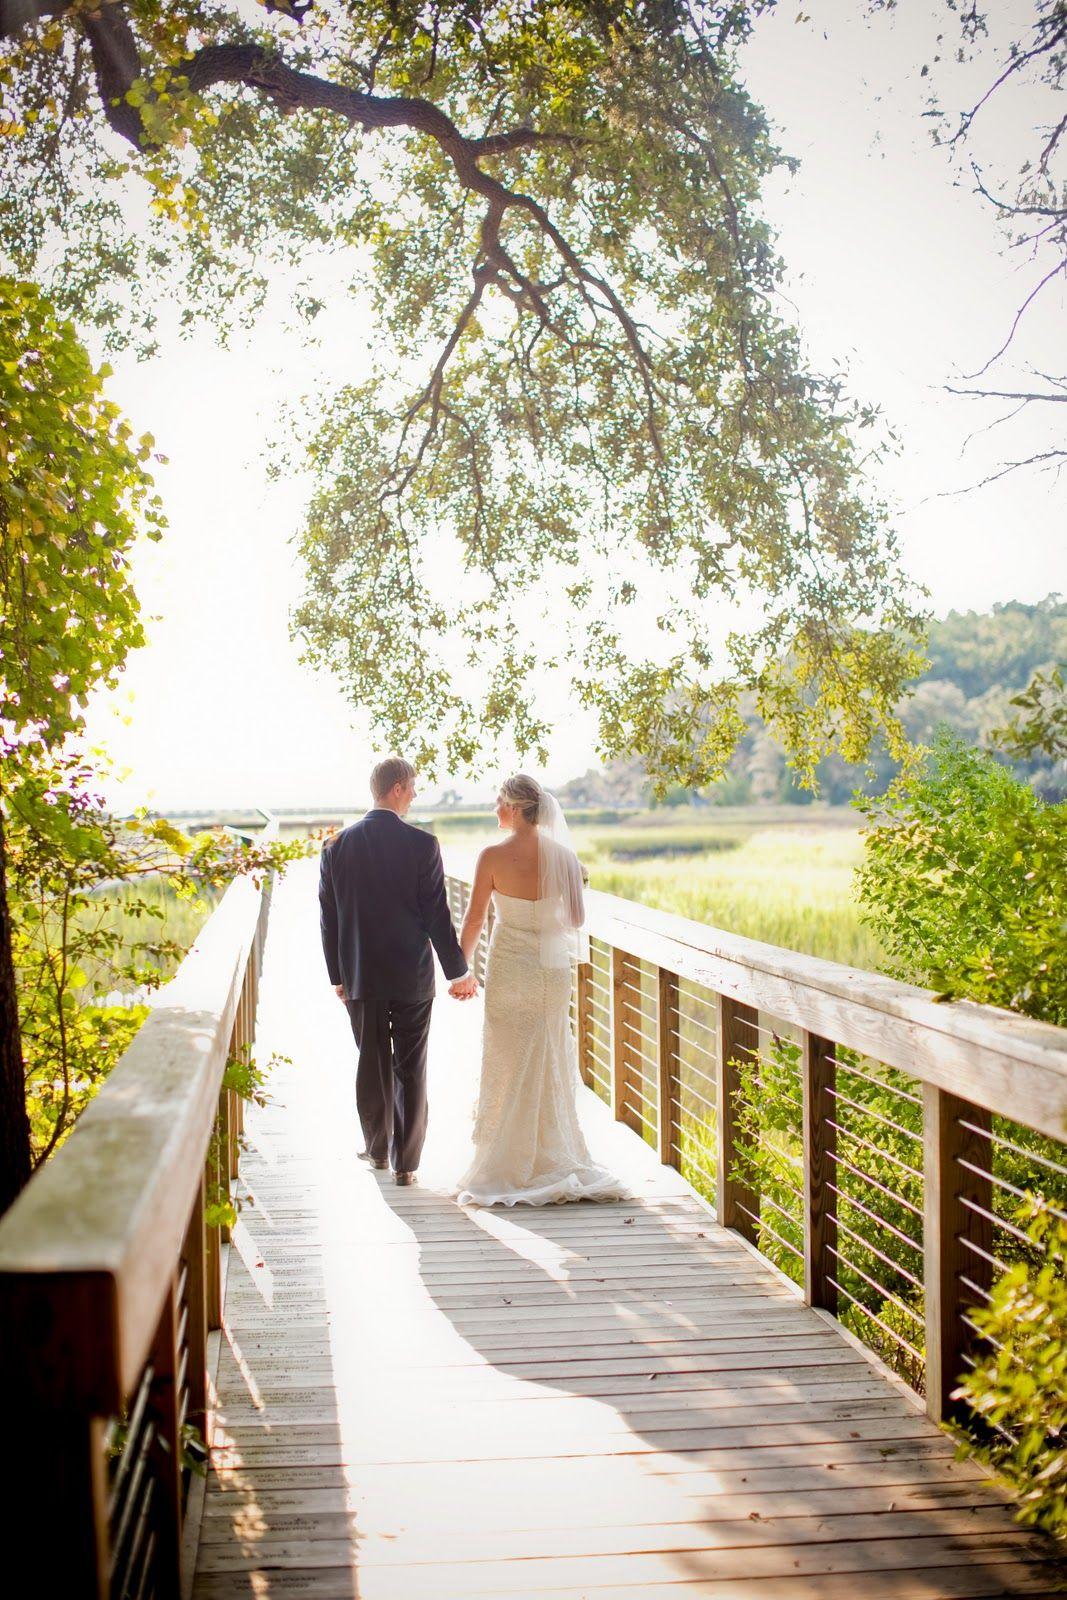 A Lowcountry Wedding Charleston Myrtle Beach Hilton Head S Favorite Resource Jennifer